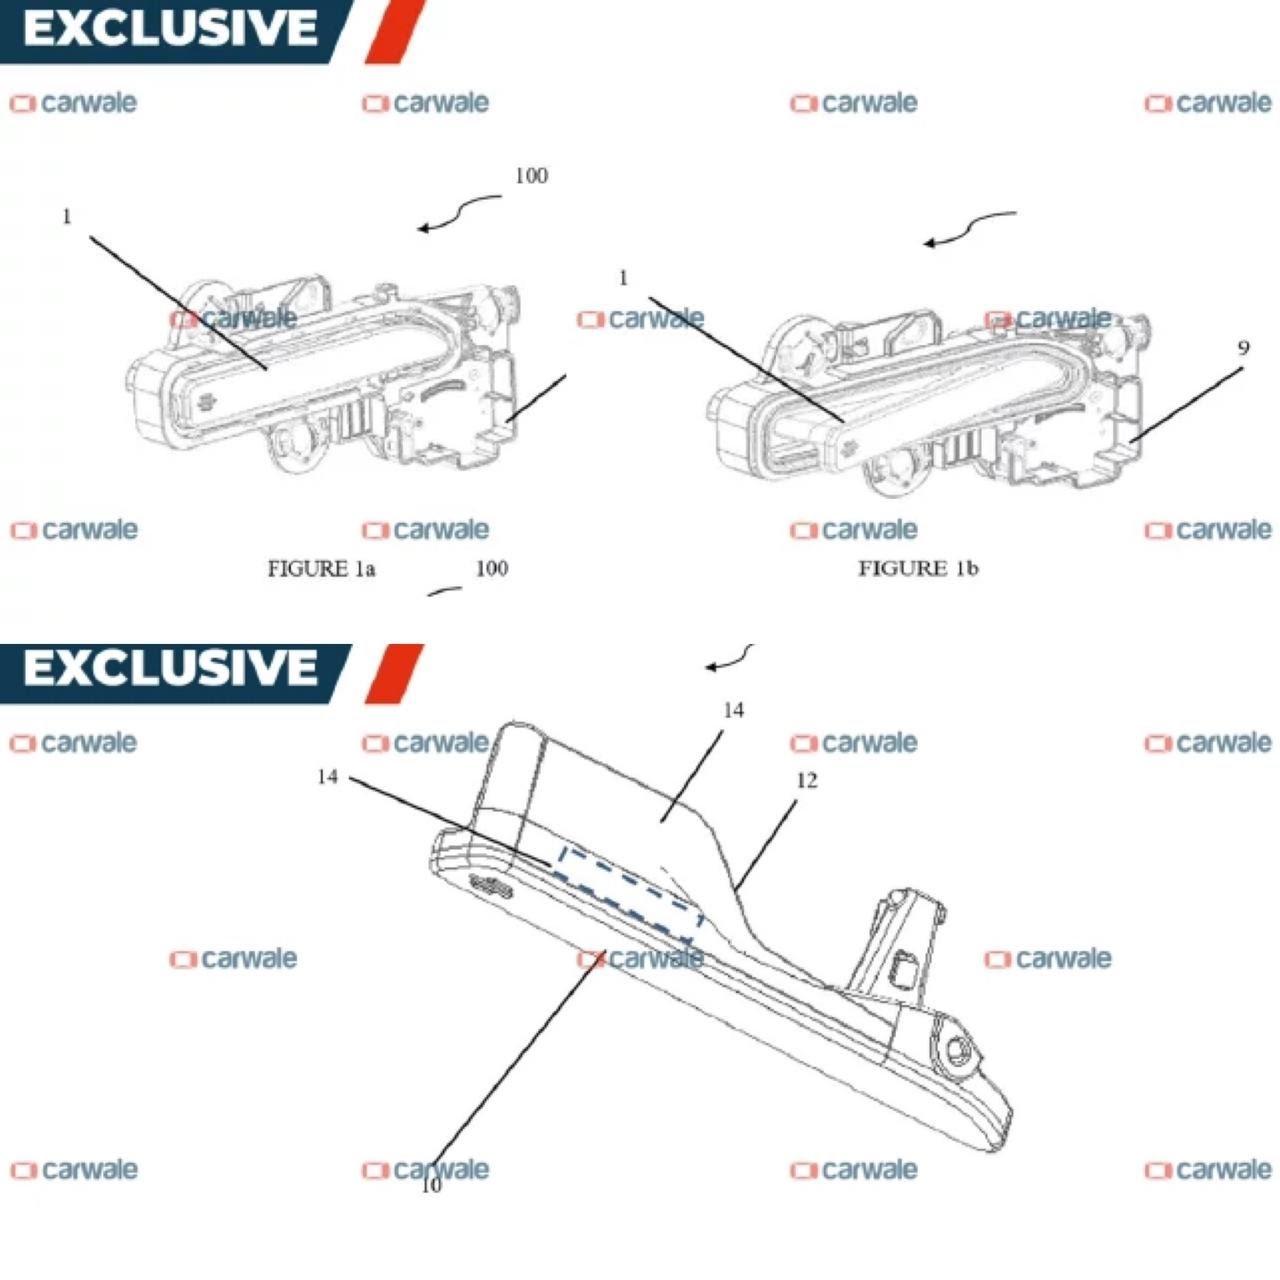 mahindra-xuv500-flush-door-handles-patent-1.jpeg